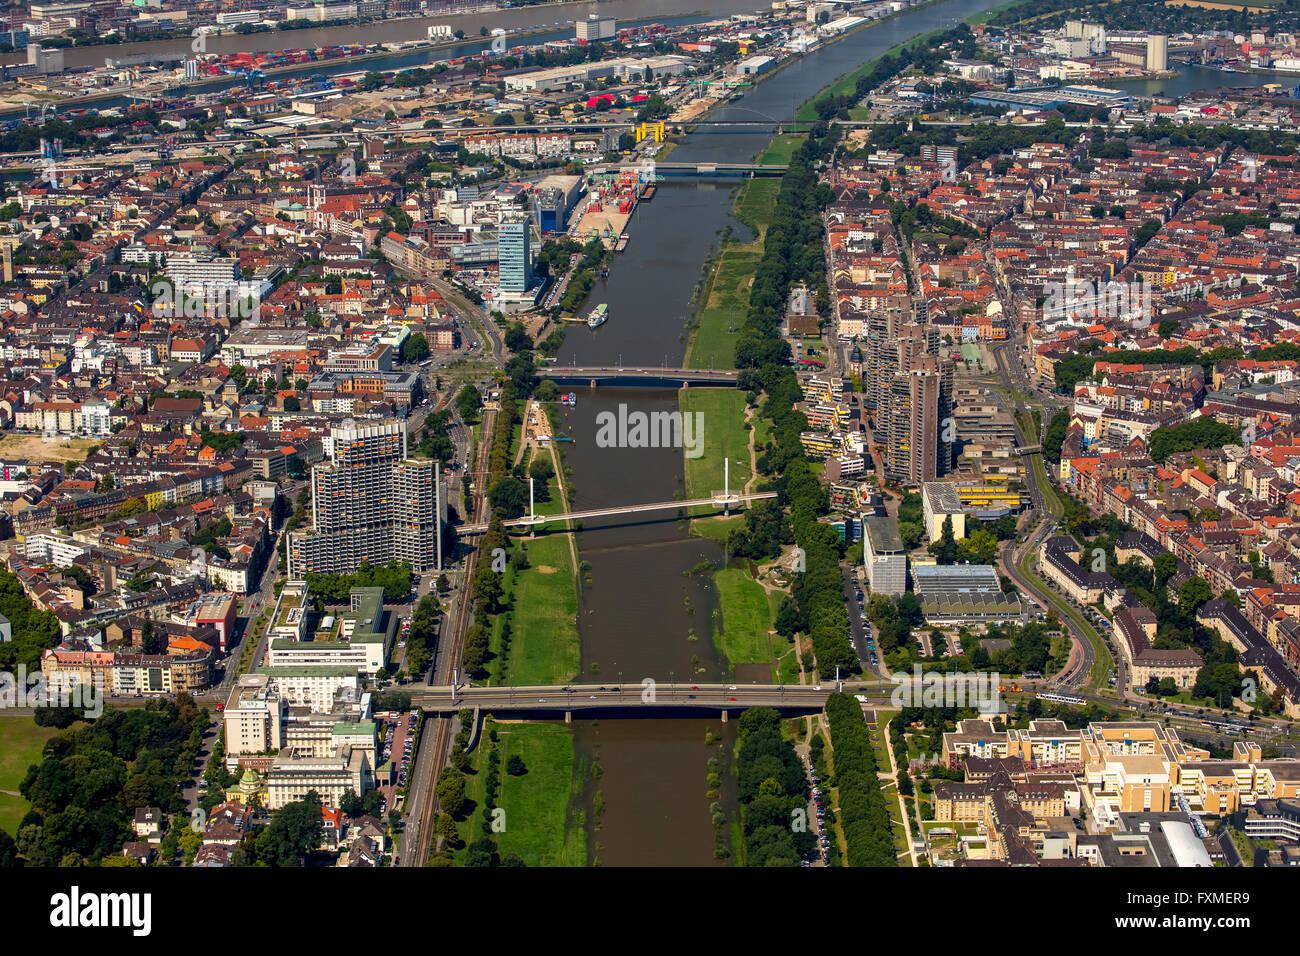 Aerial view, overlooking the River Neckar in Mannheim, Mannheim, Baden-Württemberg, Germany, Europe, Aerial - Stock Image